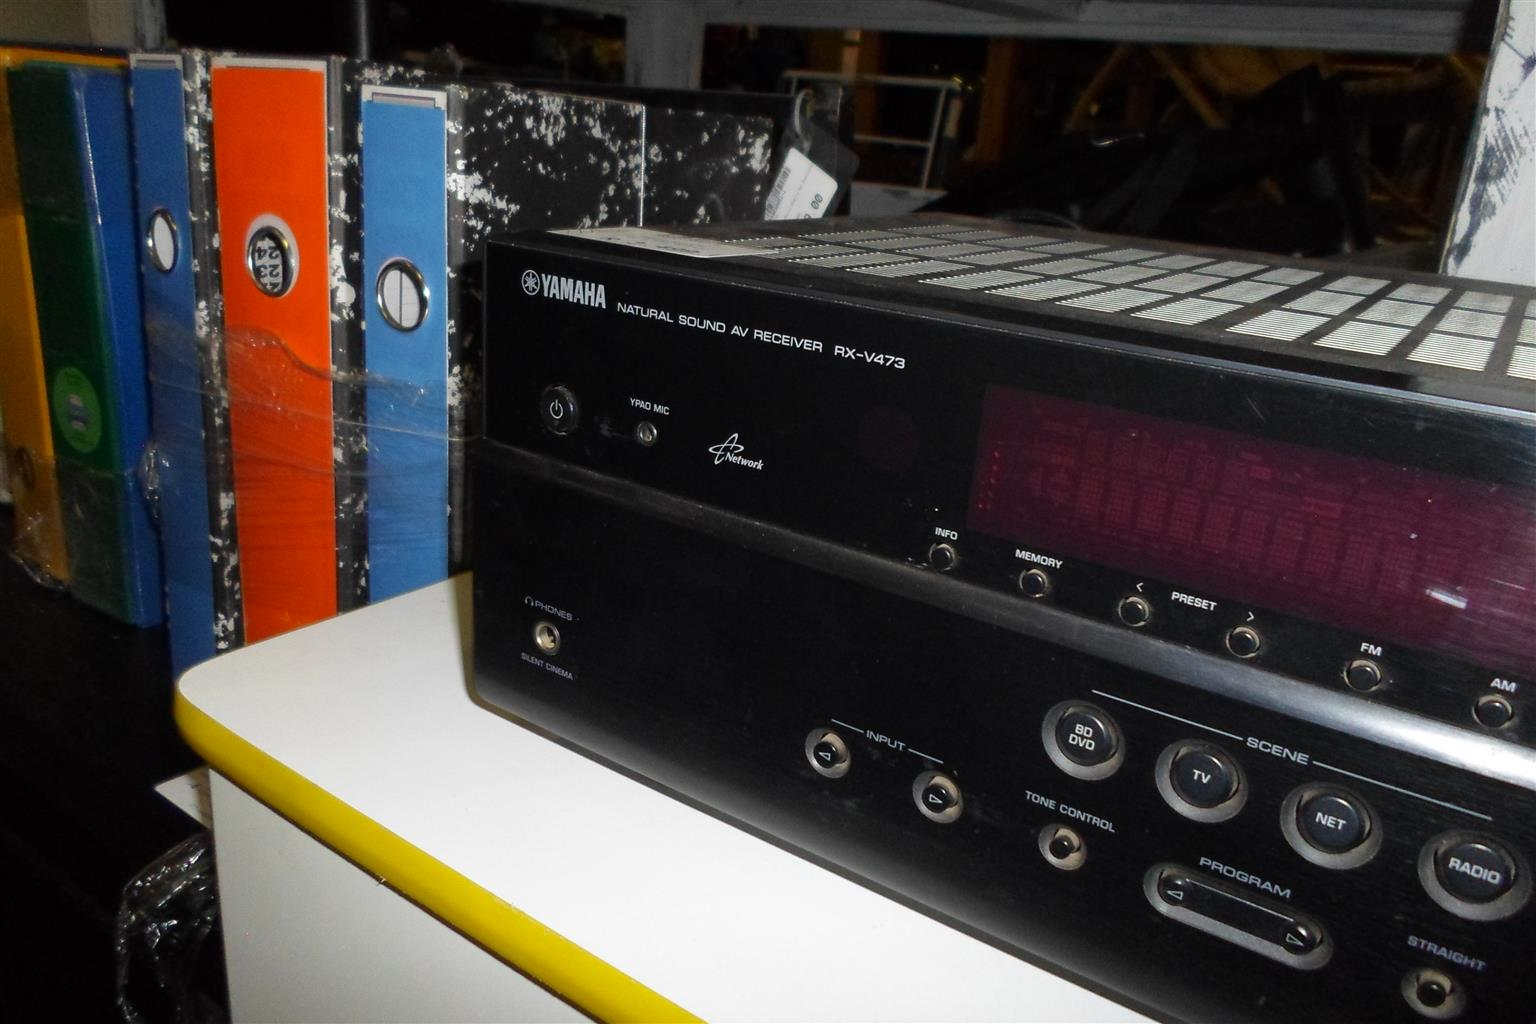 5.1 Channel Yamaha Amplifier